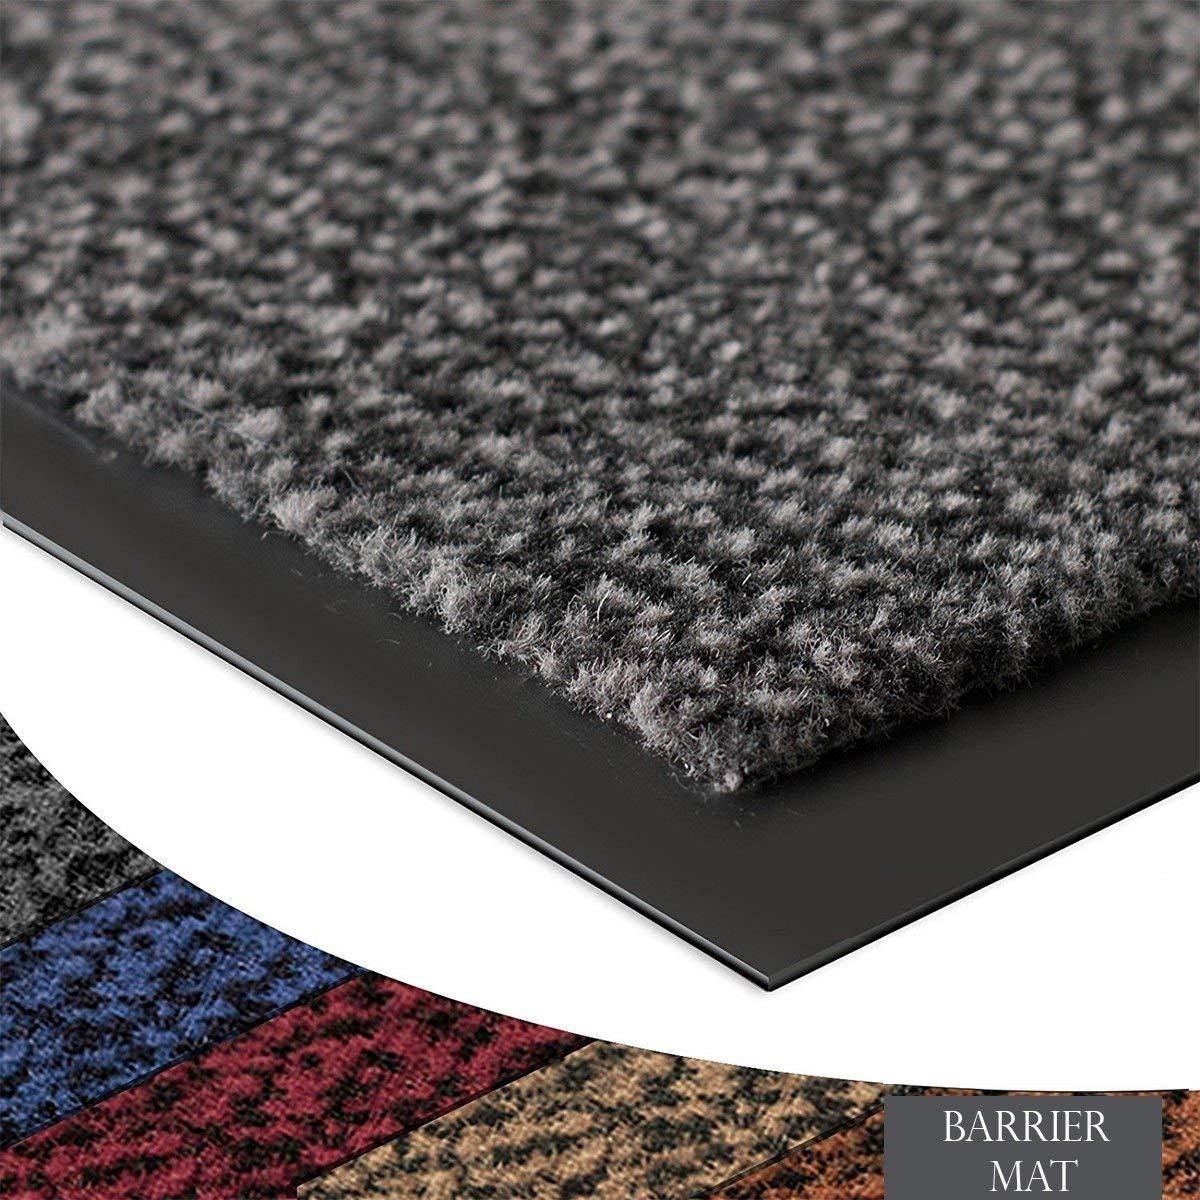 Sandal Stars Barrier Mats Heavy Quality Non Slip Hard Wearing Barrier Mat. PVC Edged Heavy Duty Kitchen Mat Rug (40 x 60 CM, Red/Black)